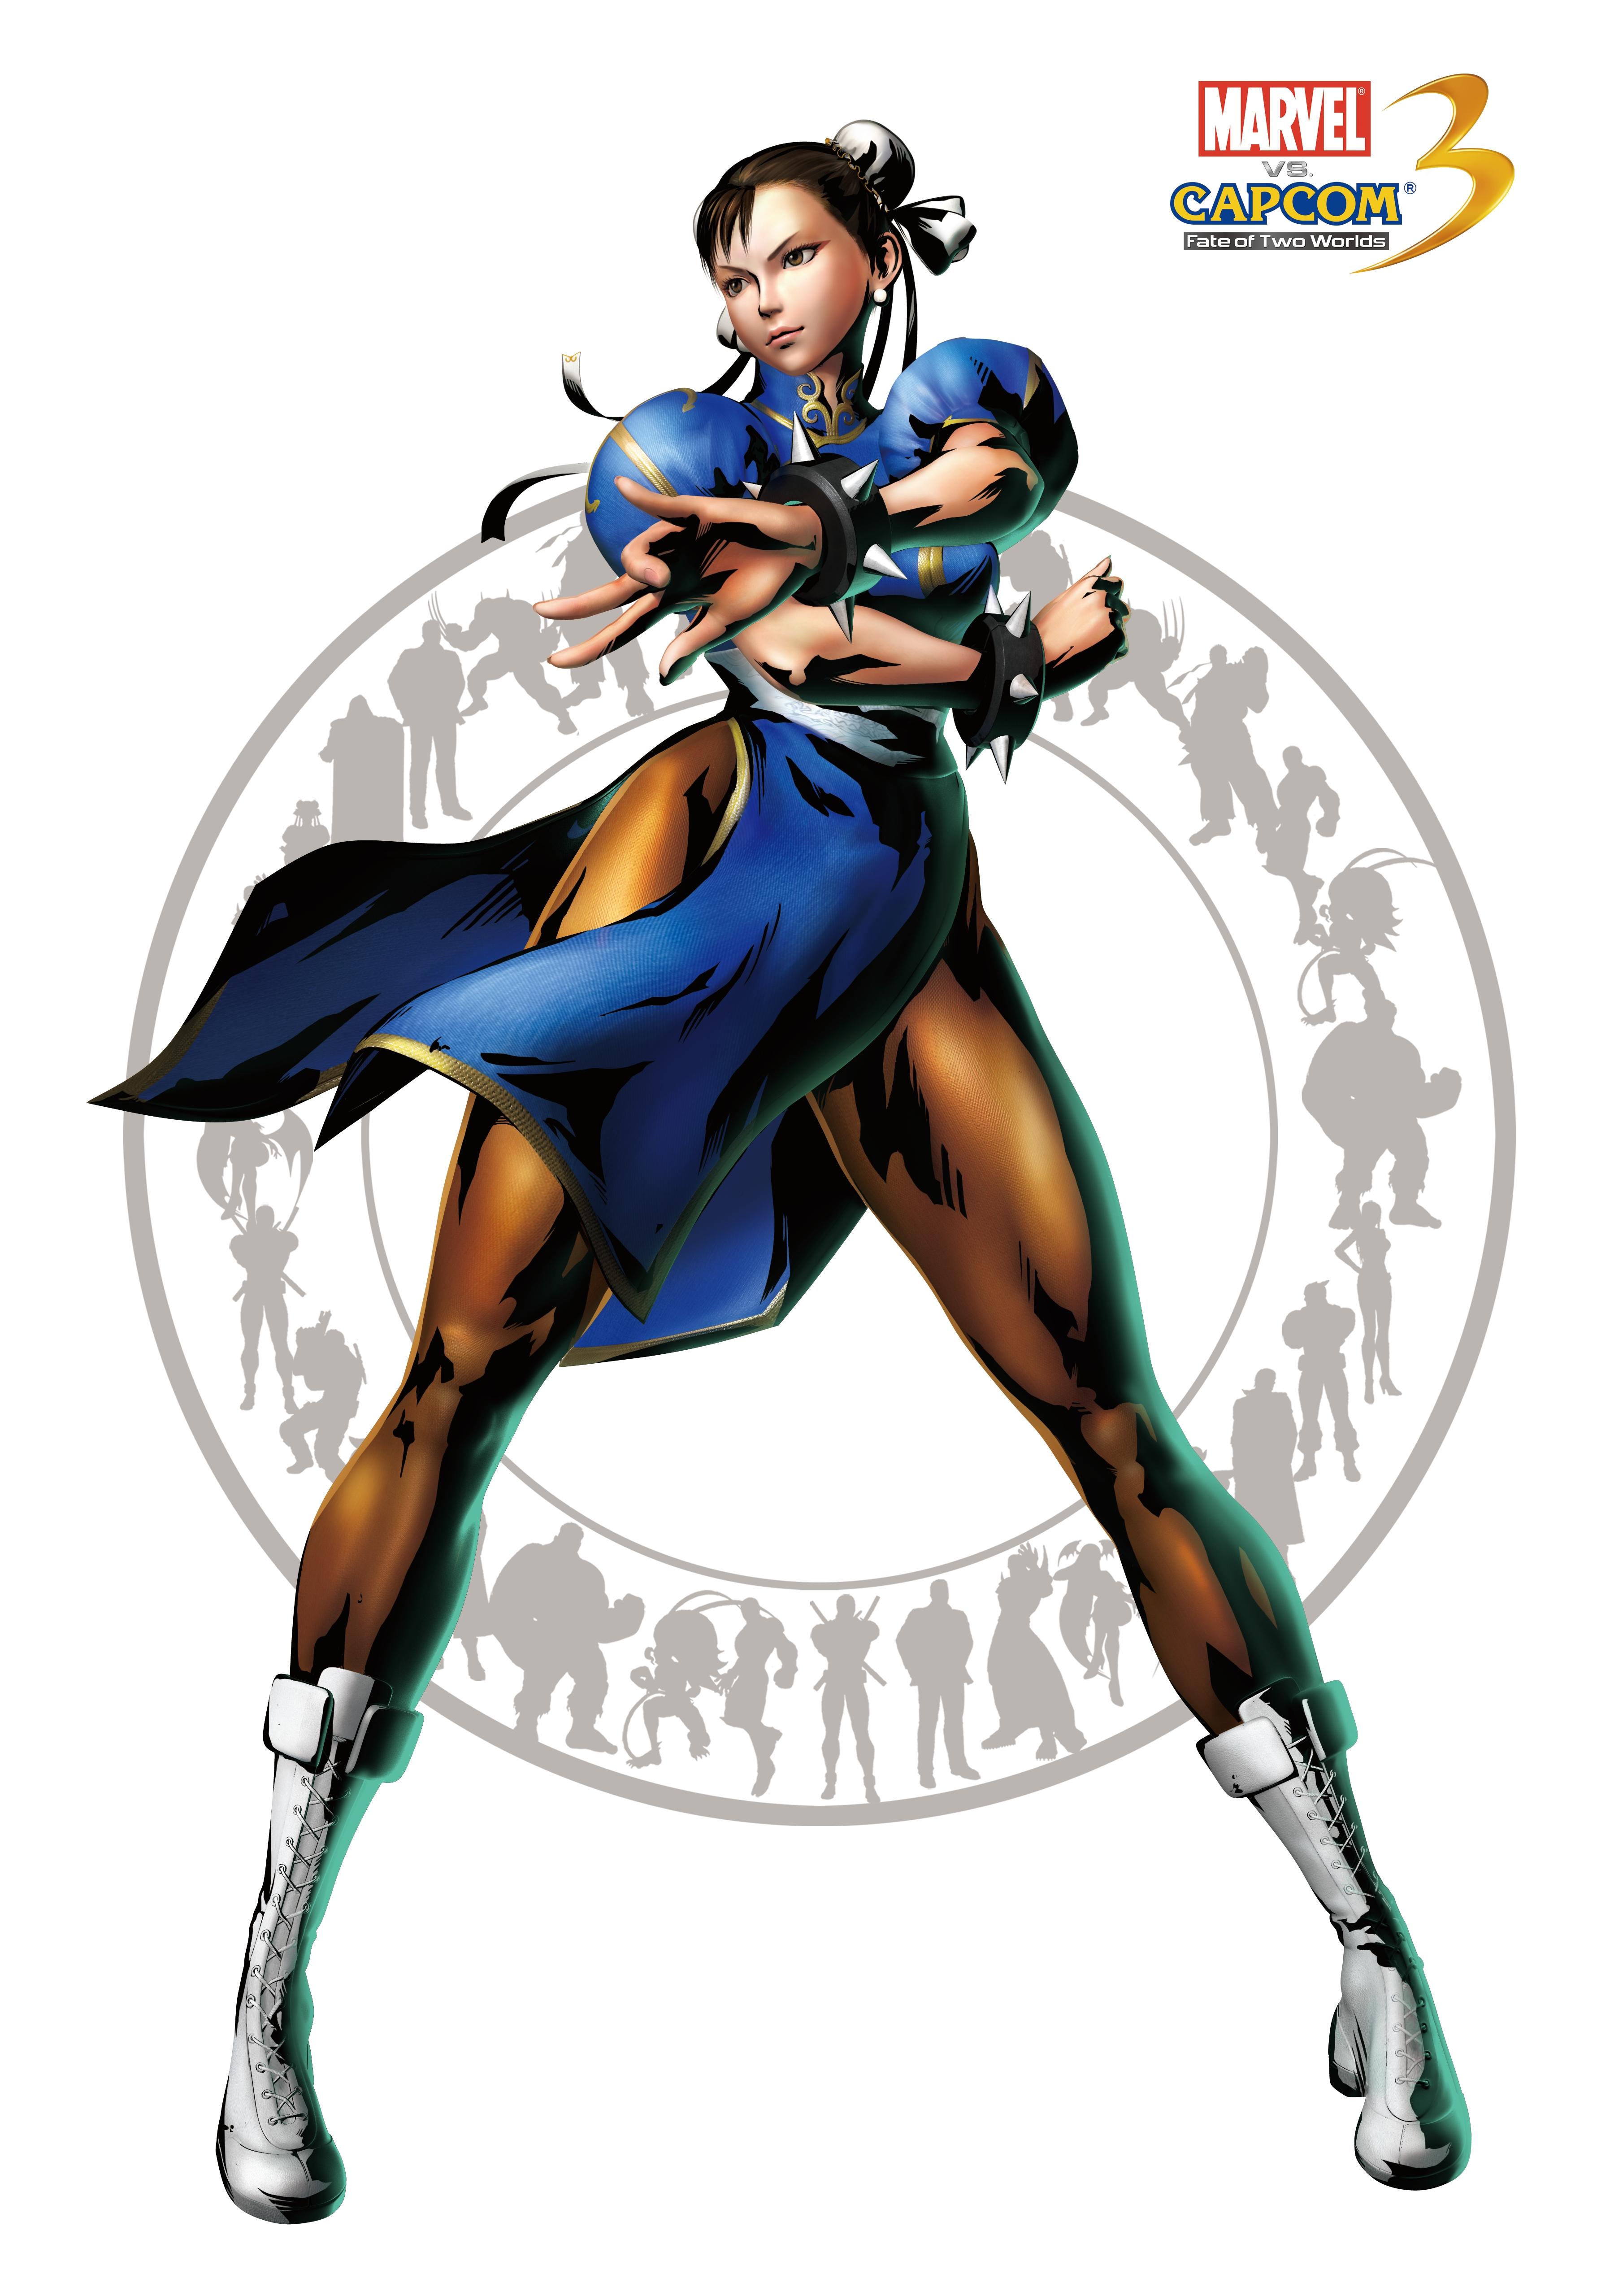 Capcom: Comic-Con Panel and New MvC3 characters (Chun-Li, Trish.